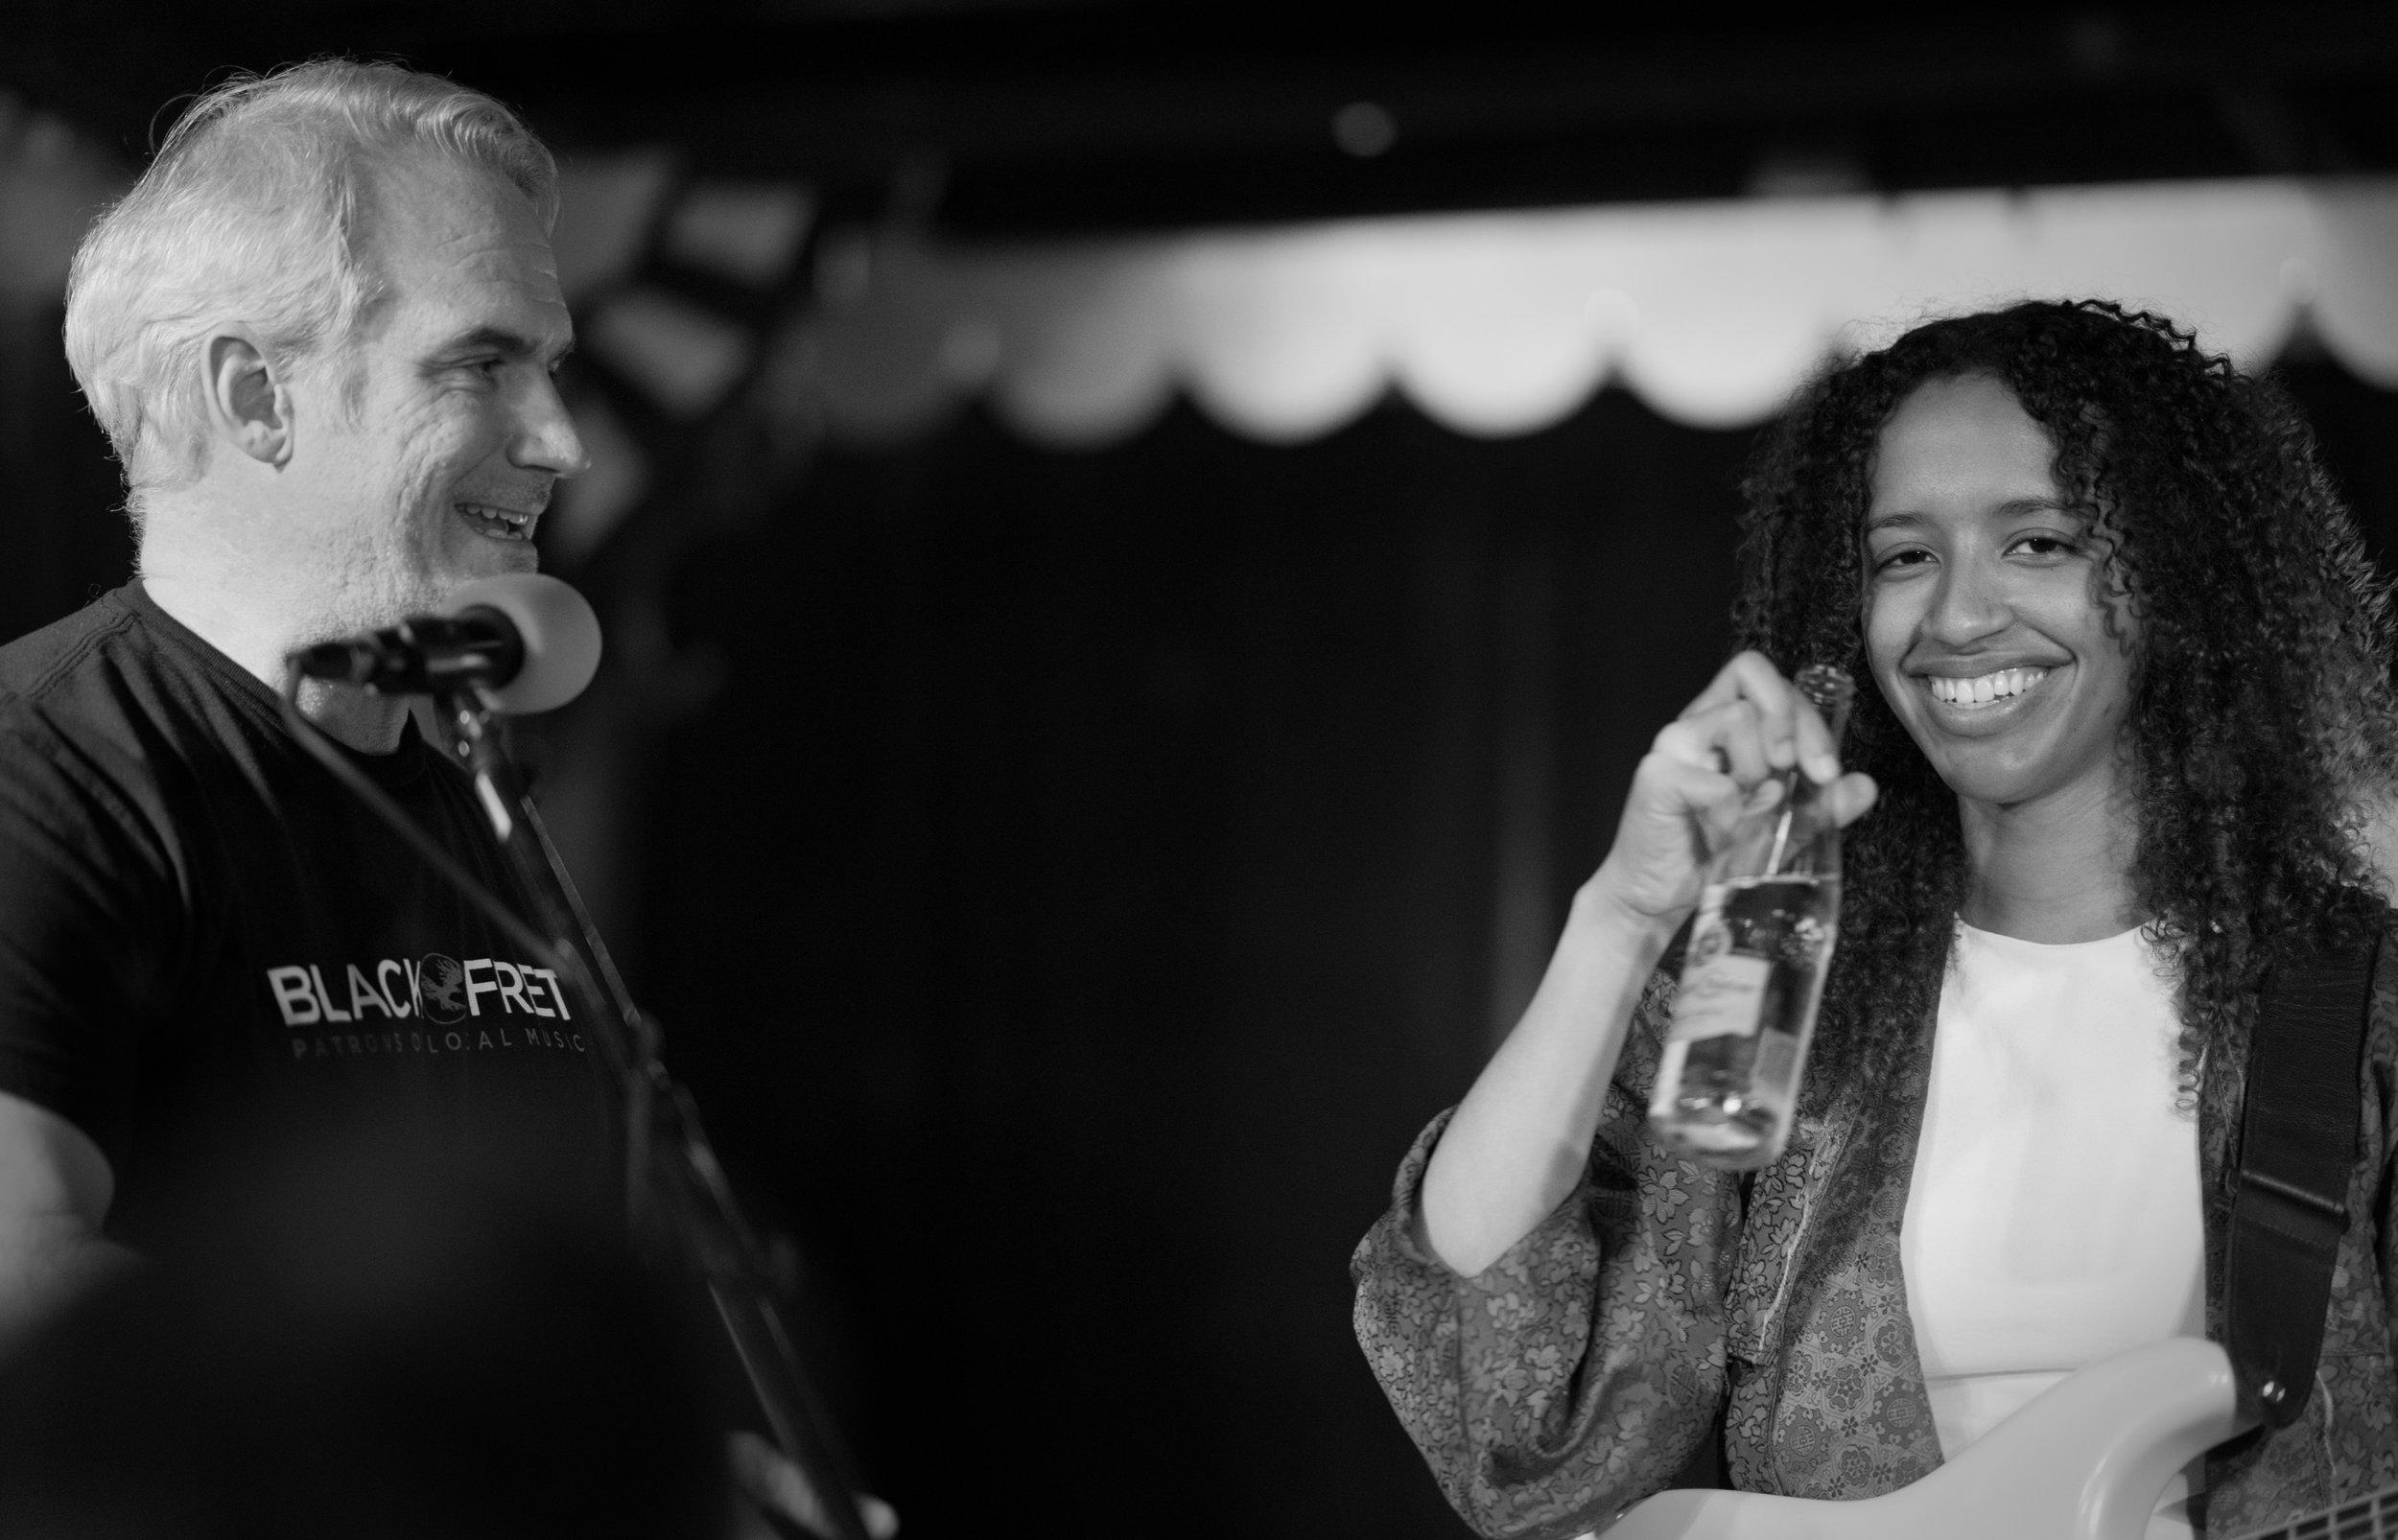 Matthew Ott, Co-founder at Black Fret, Congratulates Jackie Venson